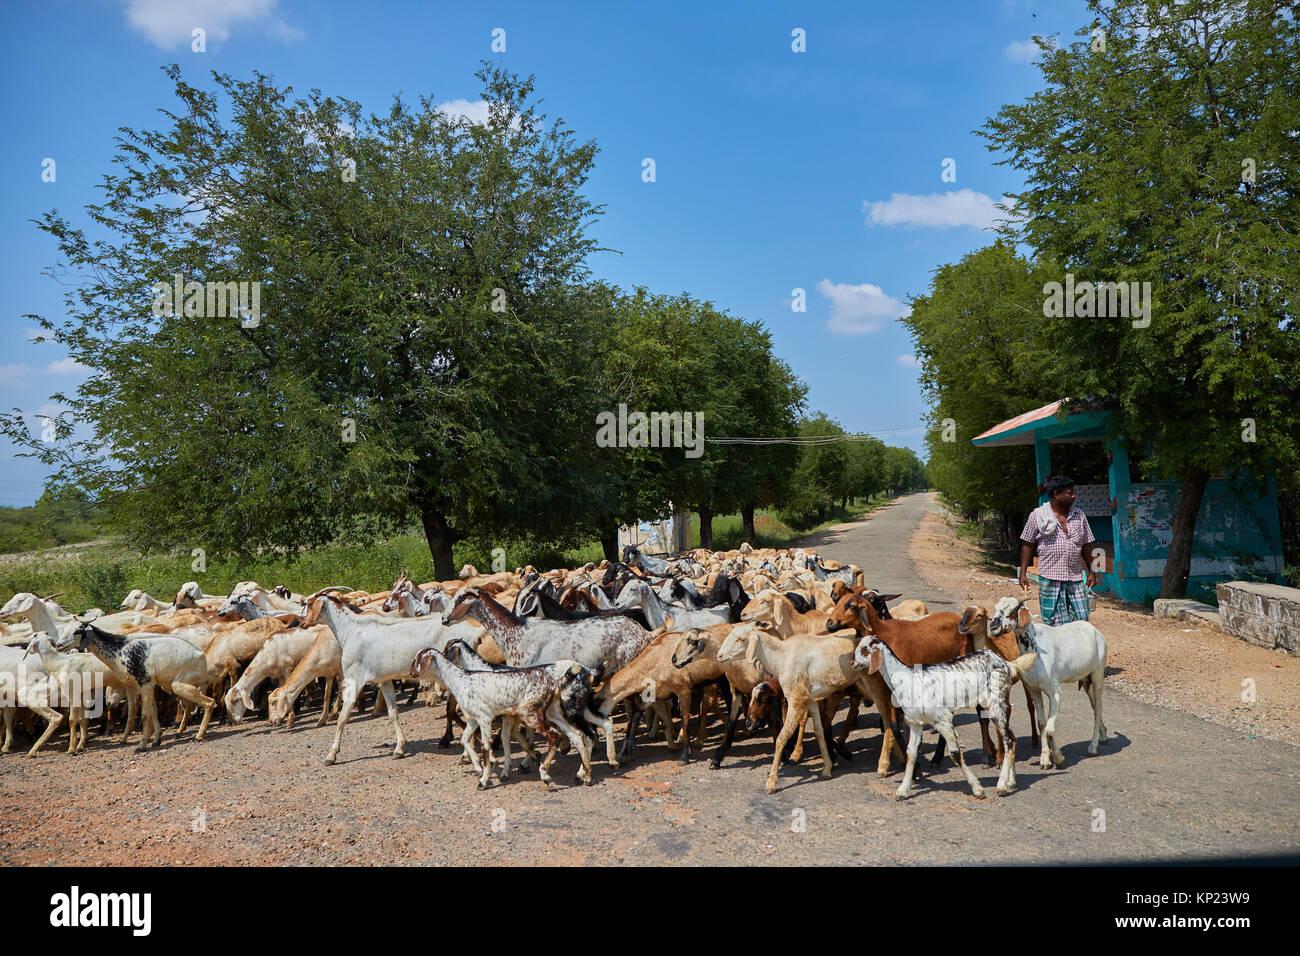 India Group Of Goats Stock Photos & India Group Of Goats